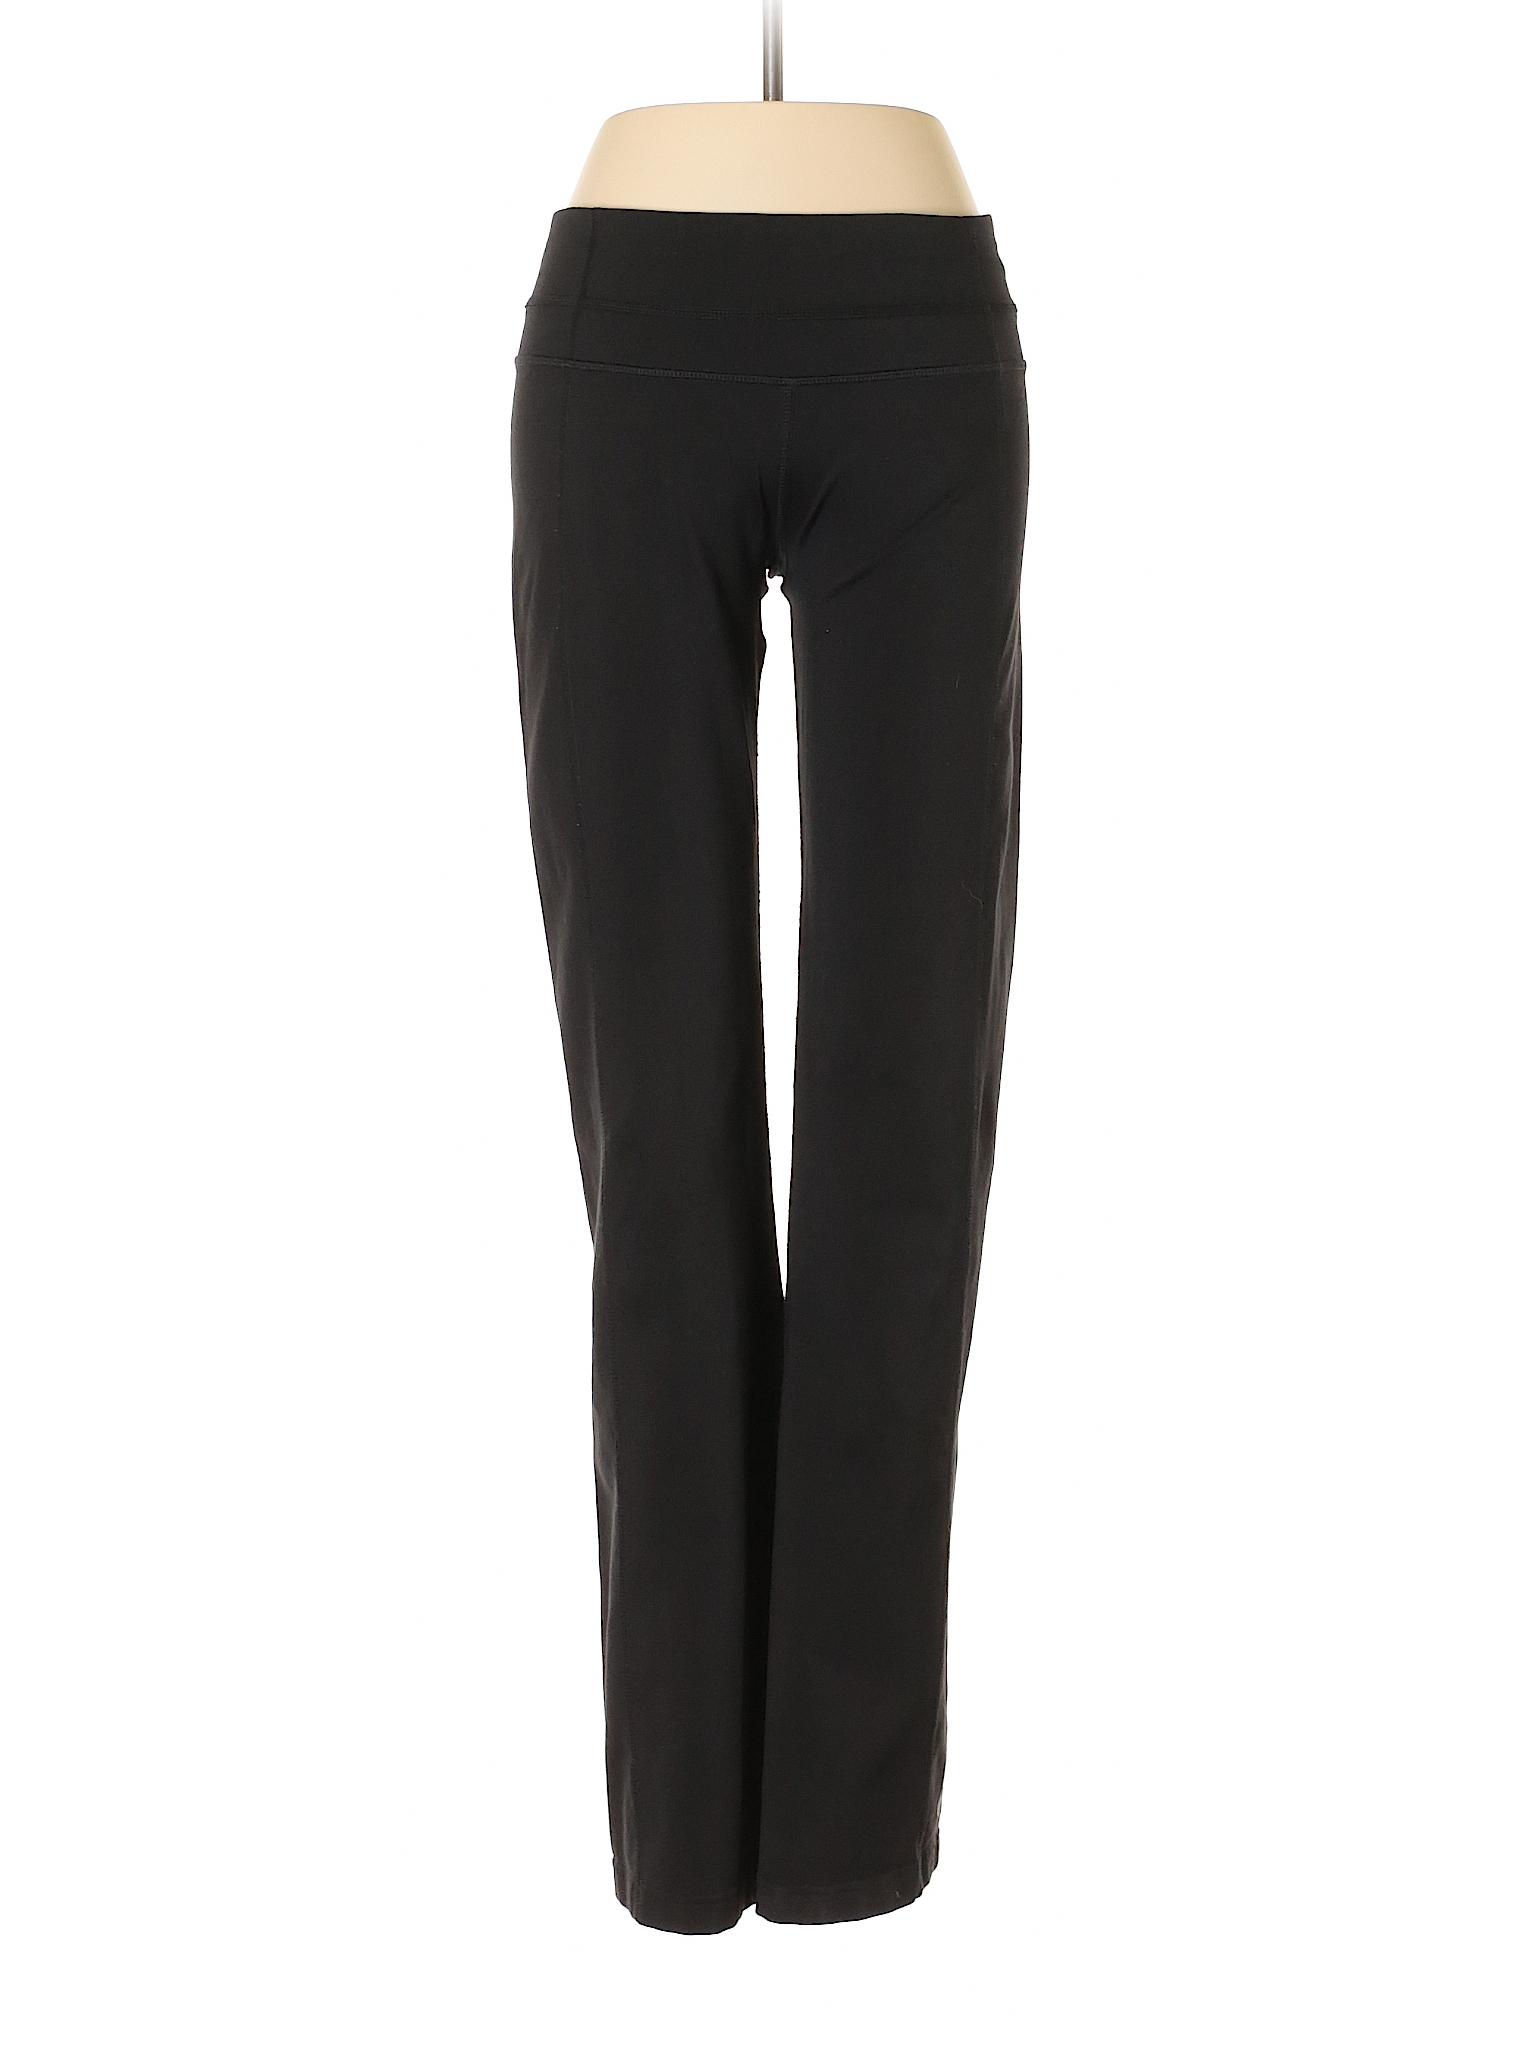 c workout moving comforter pants womens shop clothes nordstrom activewear comfort brooks women s